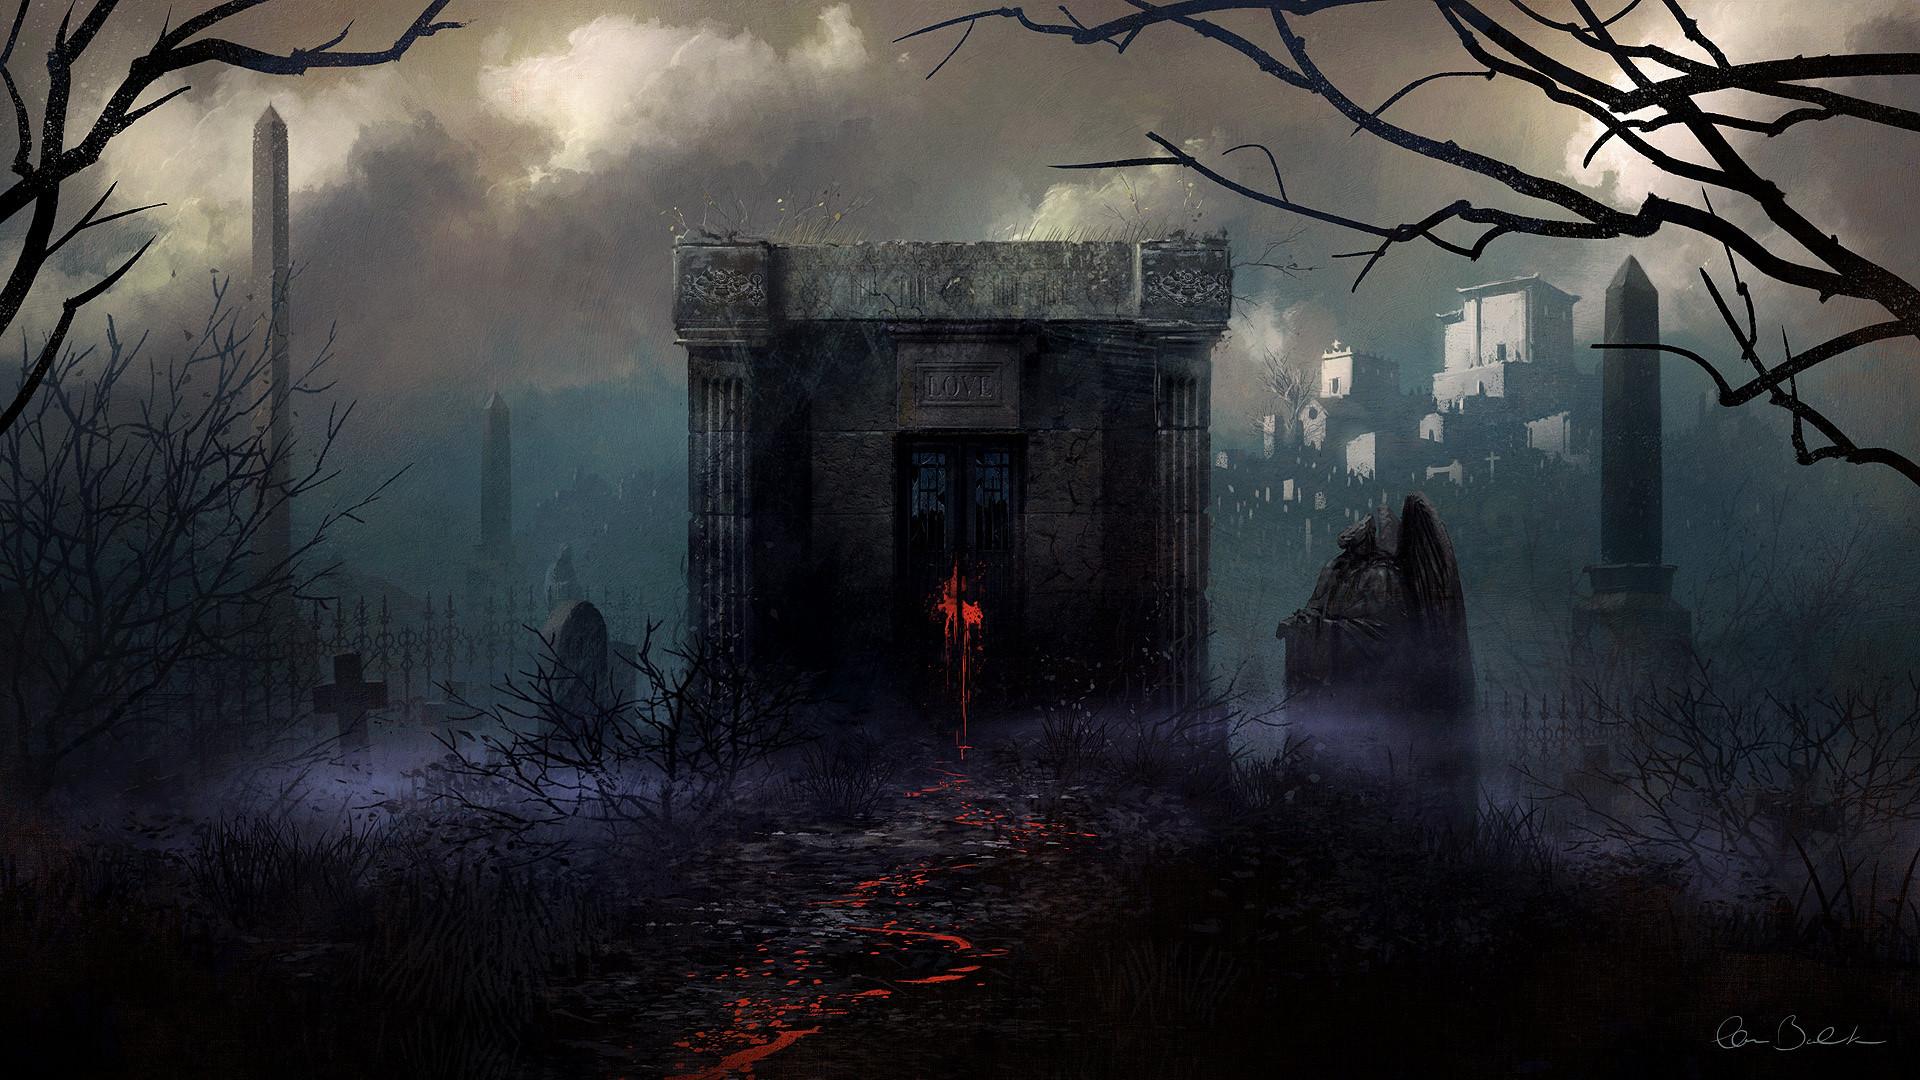 1920x1080 Download Gothic Christopher Balaskas Fog Fantasy Halloween Blood Spooky Wallpaper At Dark Wallpapers